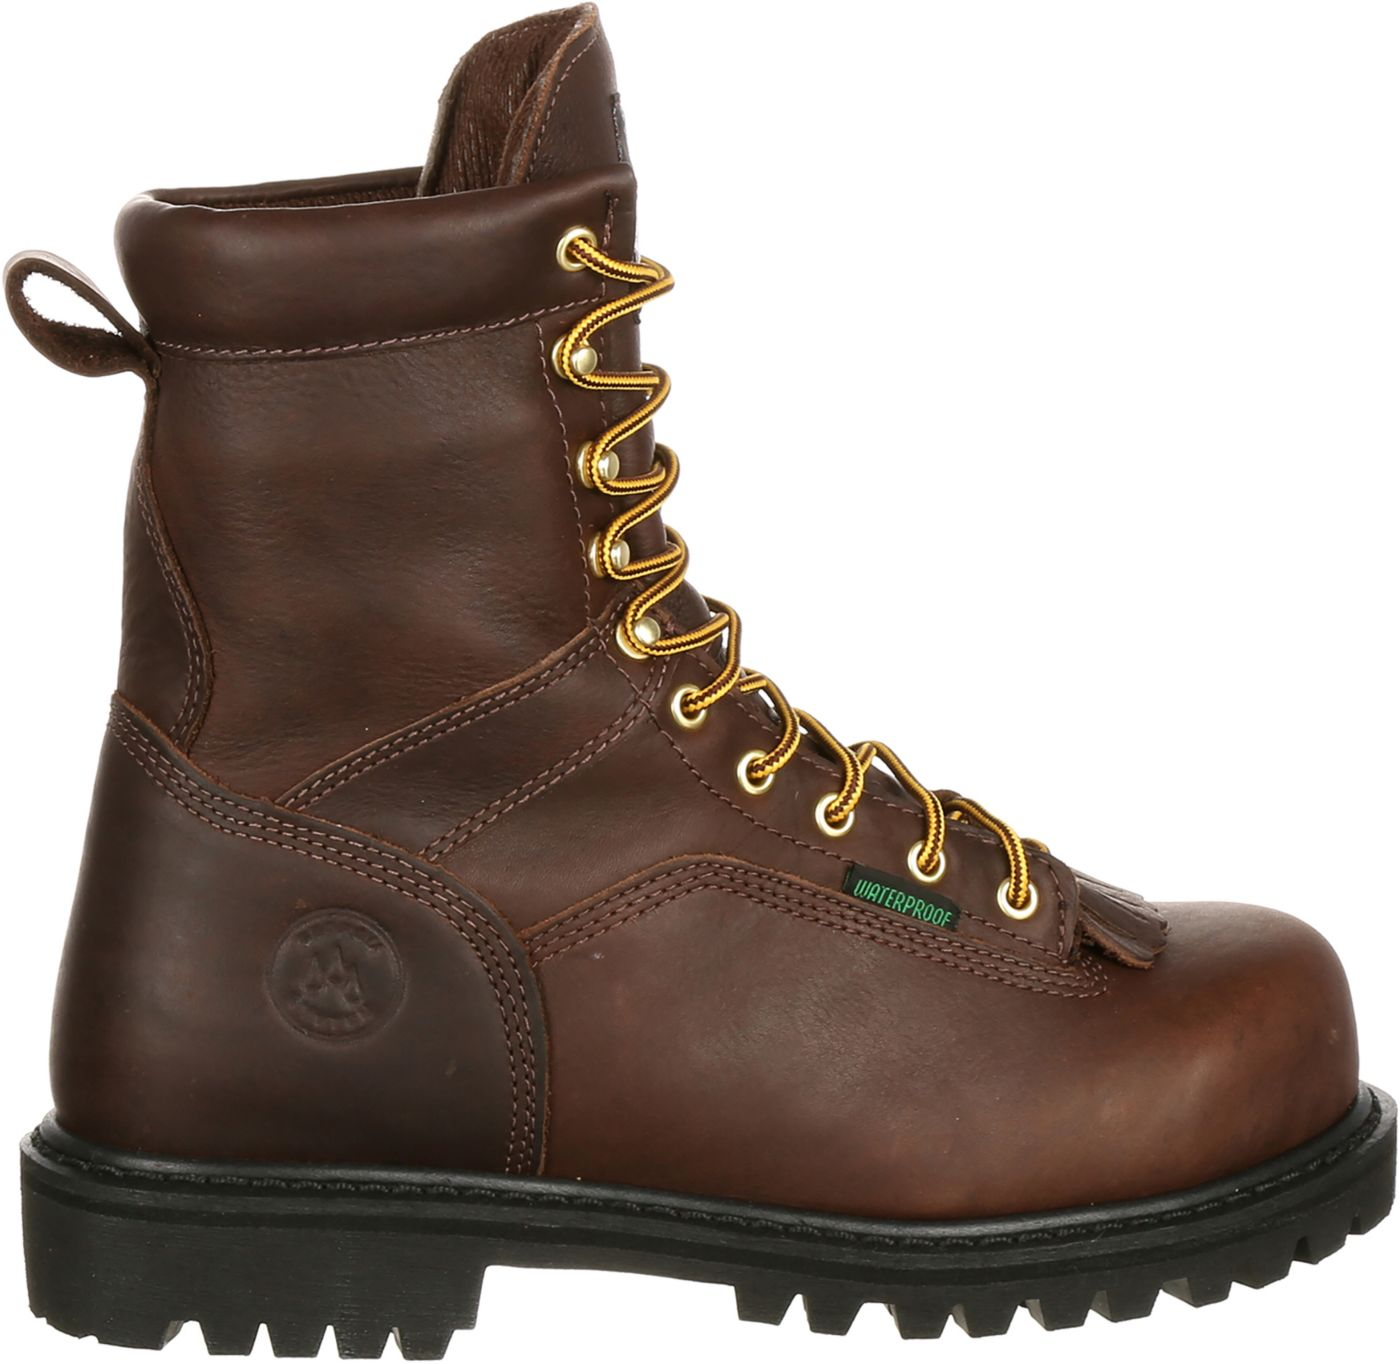 Georgia Boot Men's Lace-to-Toe EH Waterproof Steel Toe Work Boots